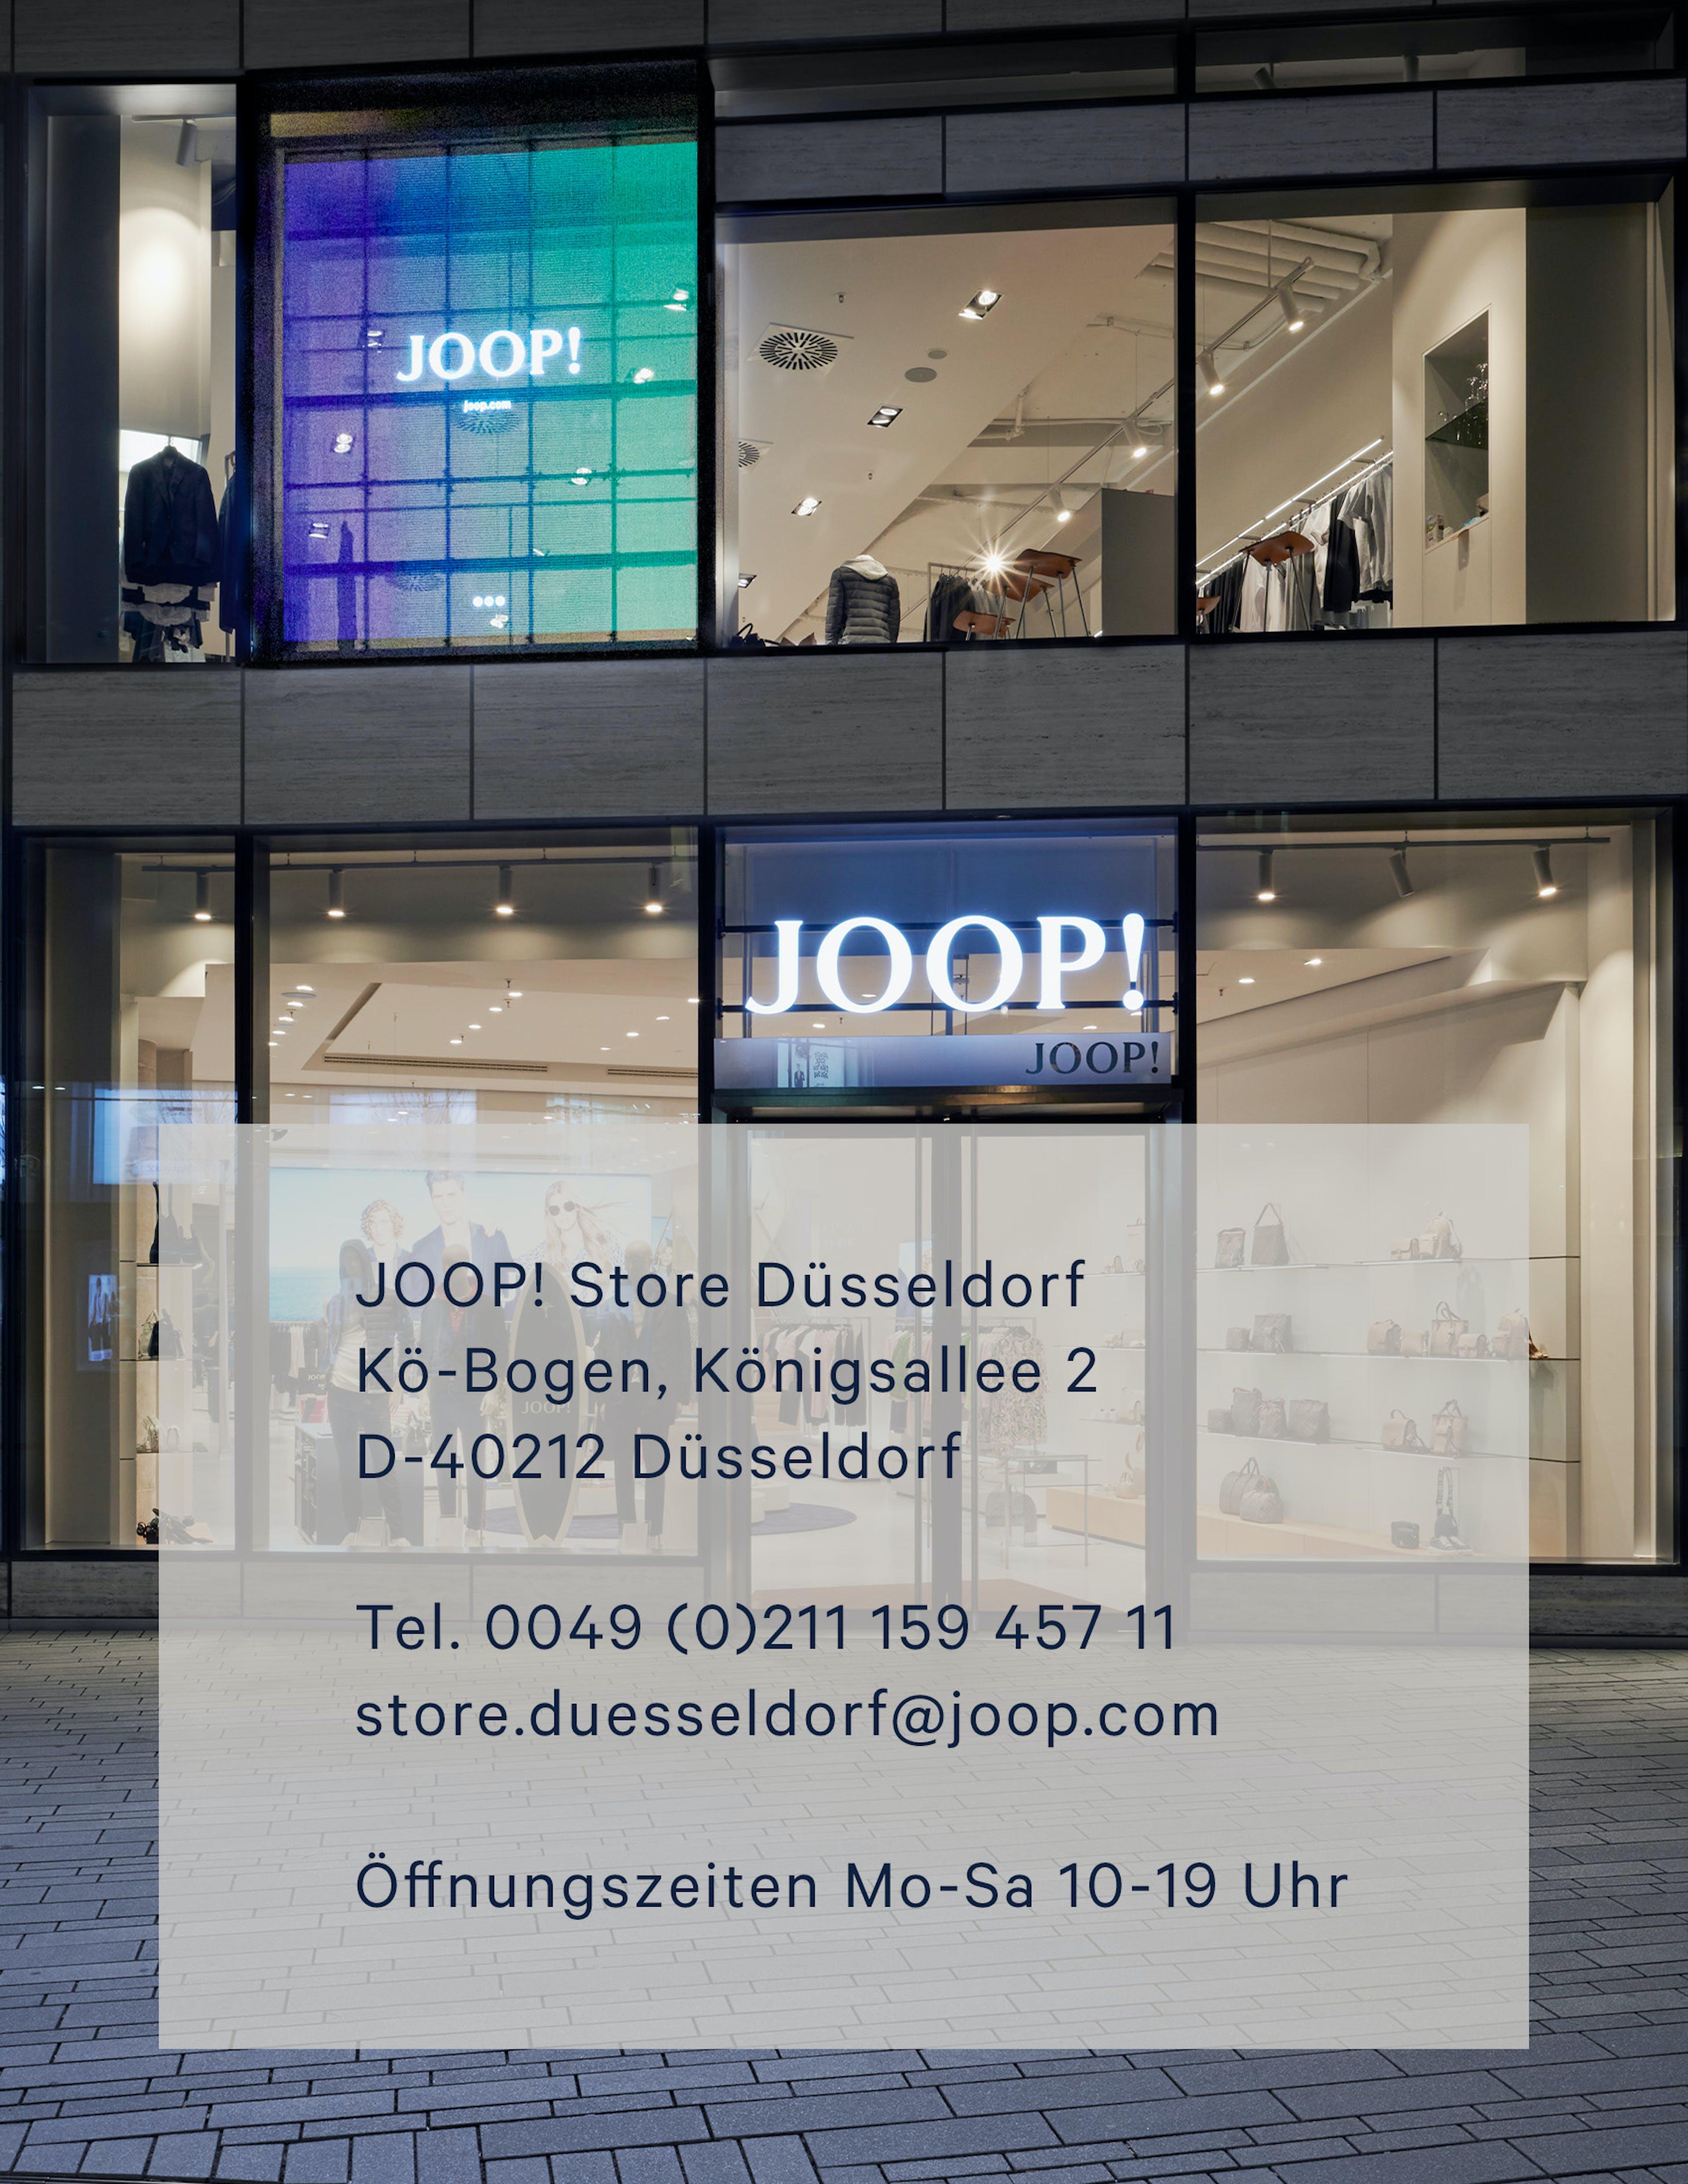 JOOP! Store Düsseldorf Adresse